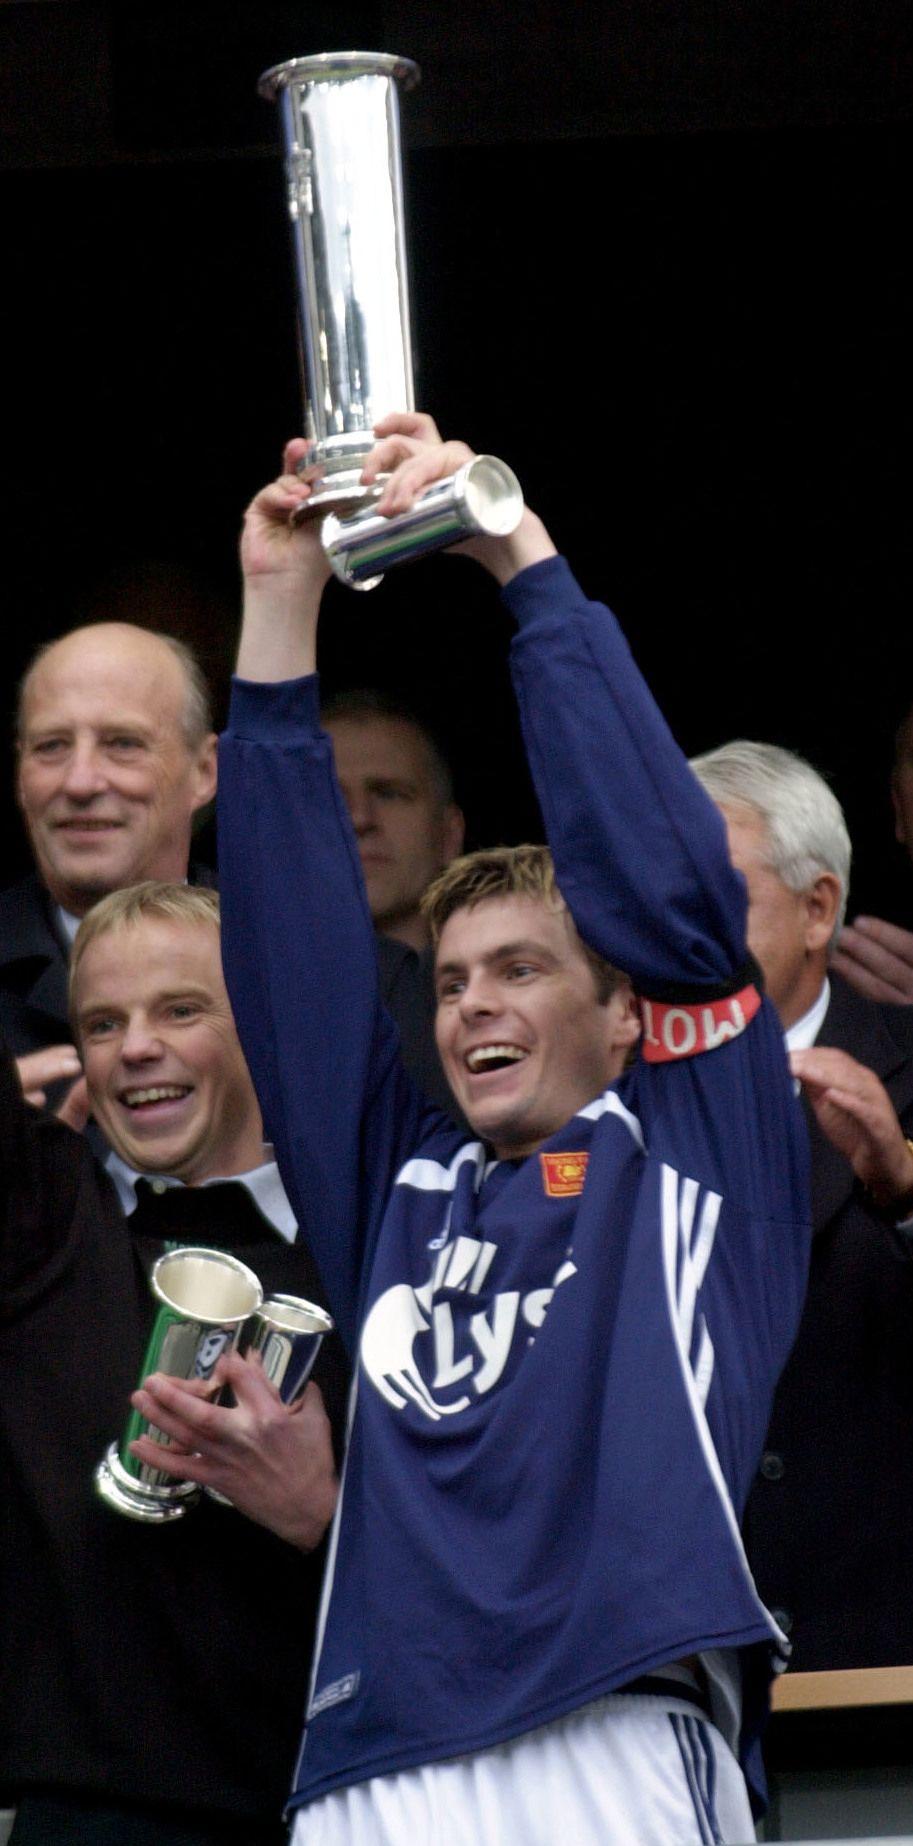 HØYDEPUNKTET: Bjarte Lunde Aarsheim løfter kongepokalen foran Kong Harald på Ullevaal stadion i 2001. Siden da har ikke Viking vunnet en eneste tittel.